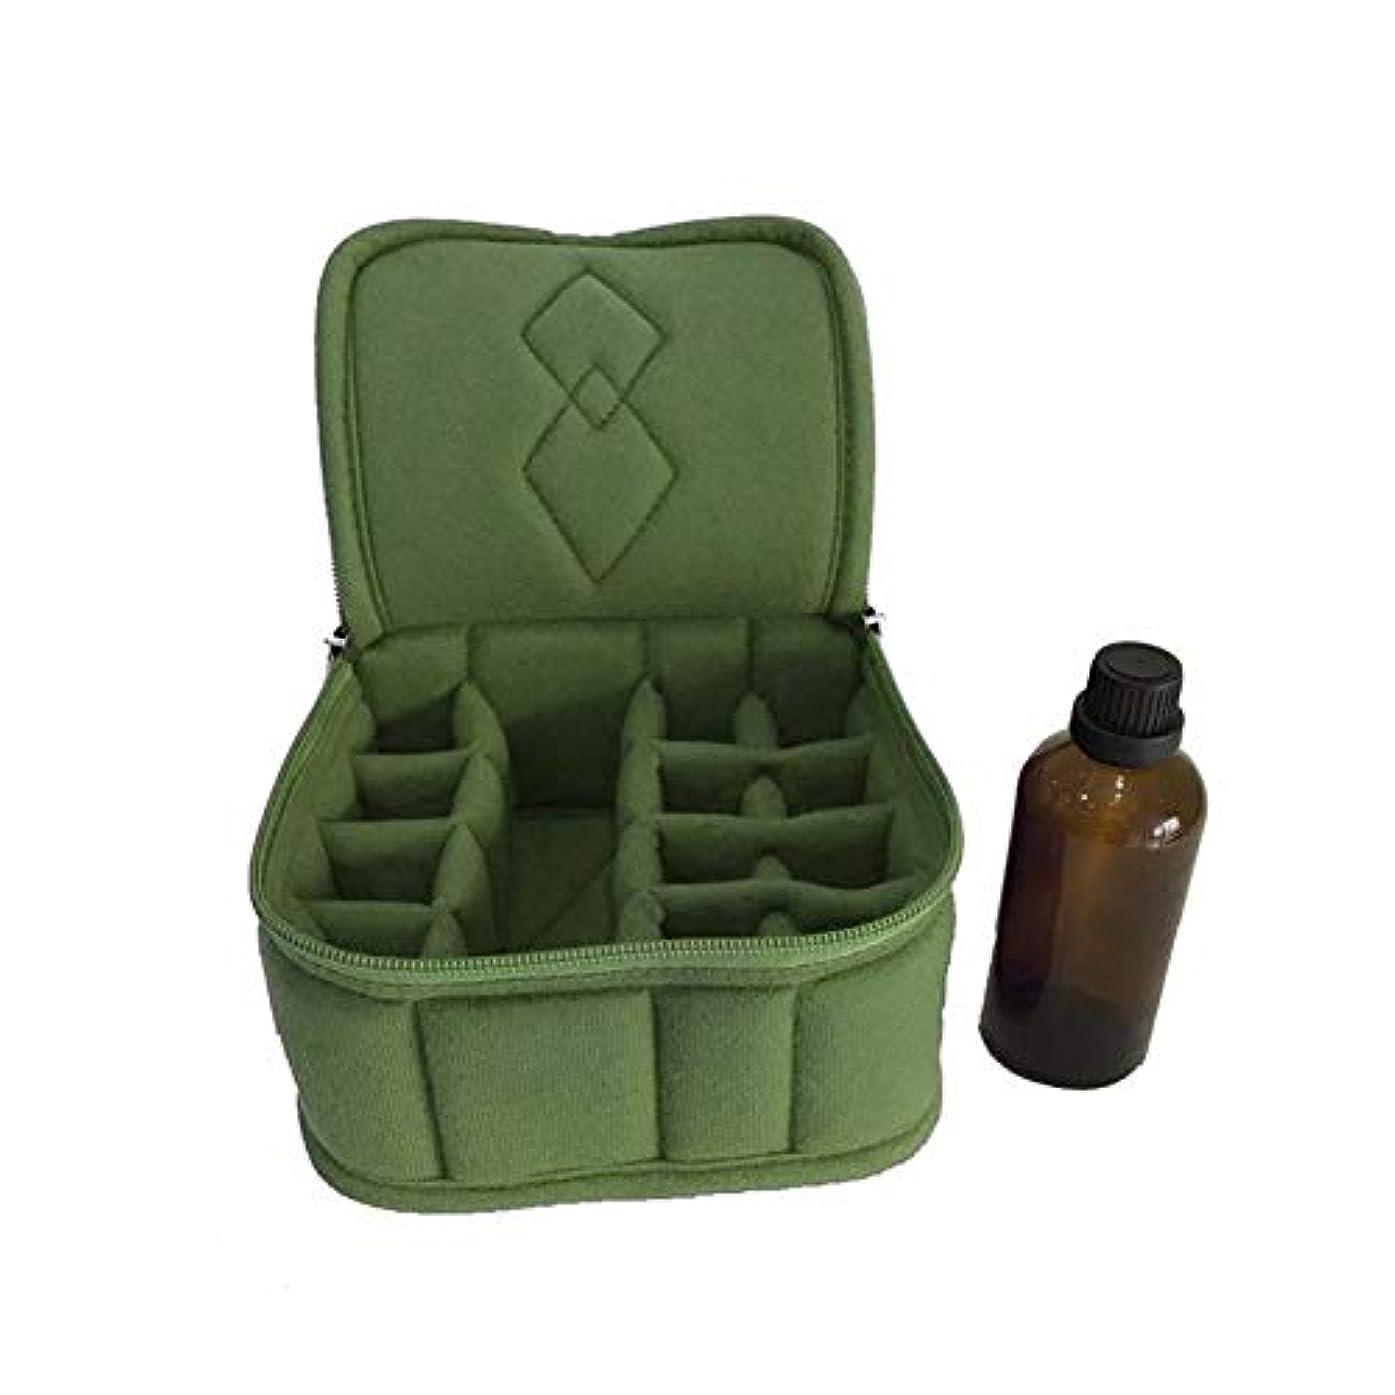 Pursue エッセンシャルオイル収納ケース アロマオイル収納ボックス アロマポーチ収納ケース 耐震 携帯便利 香水収納ポーチ 化粧ポーチ 12+1本用